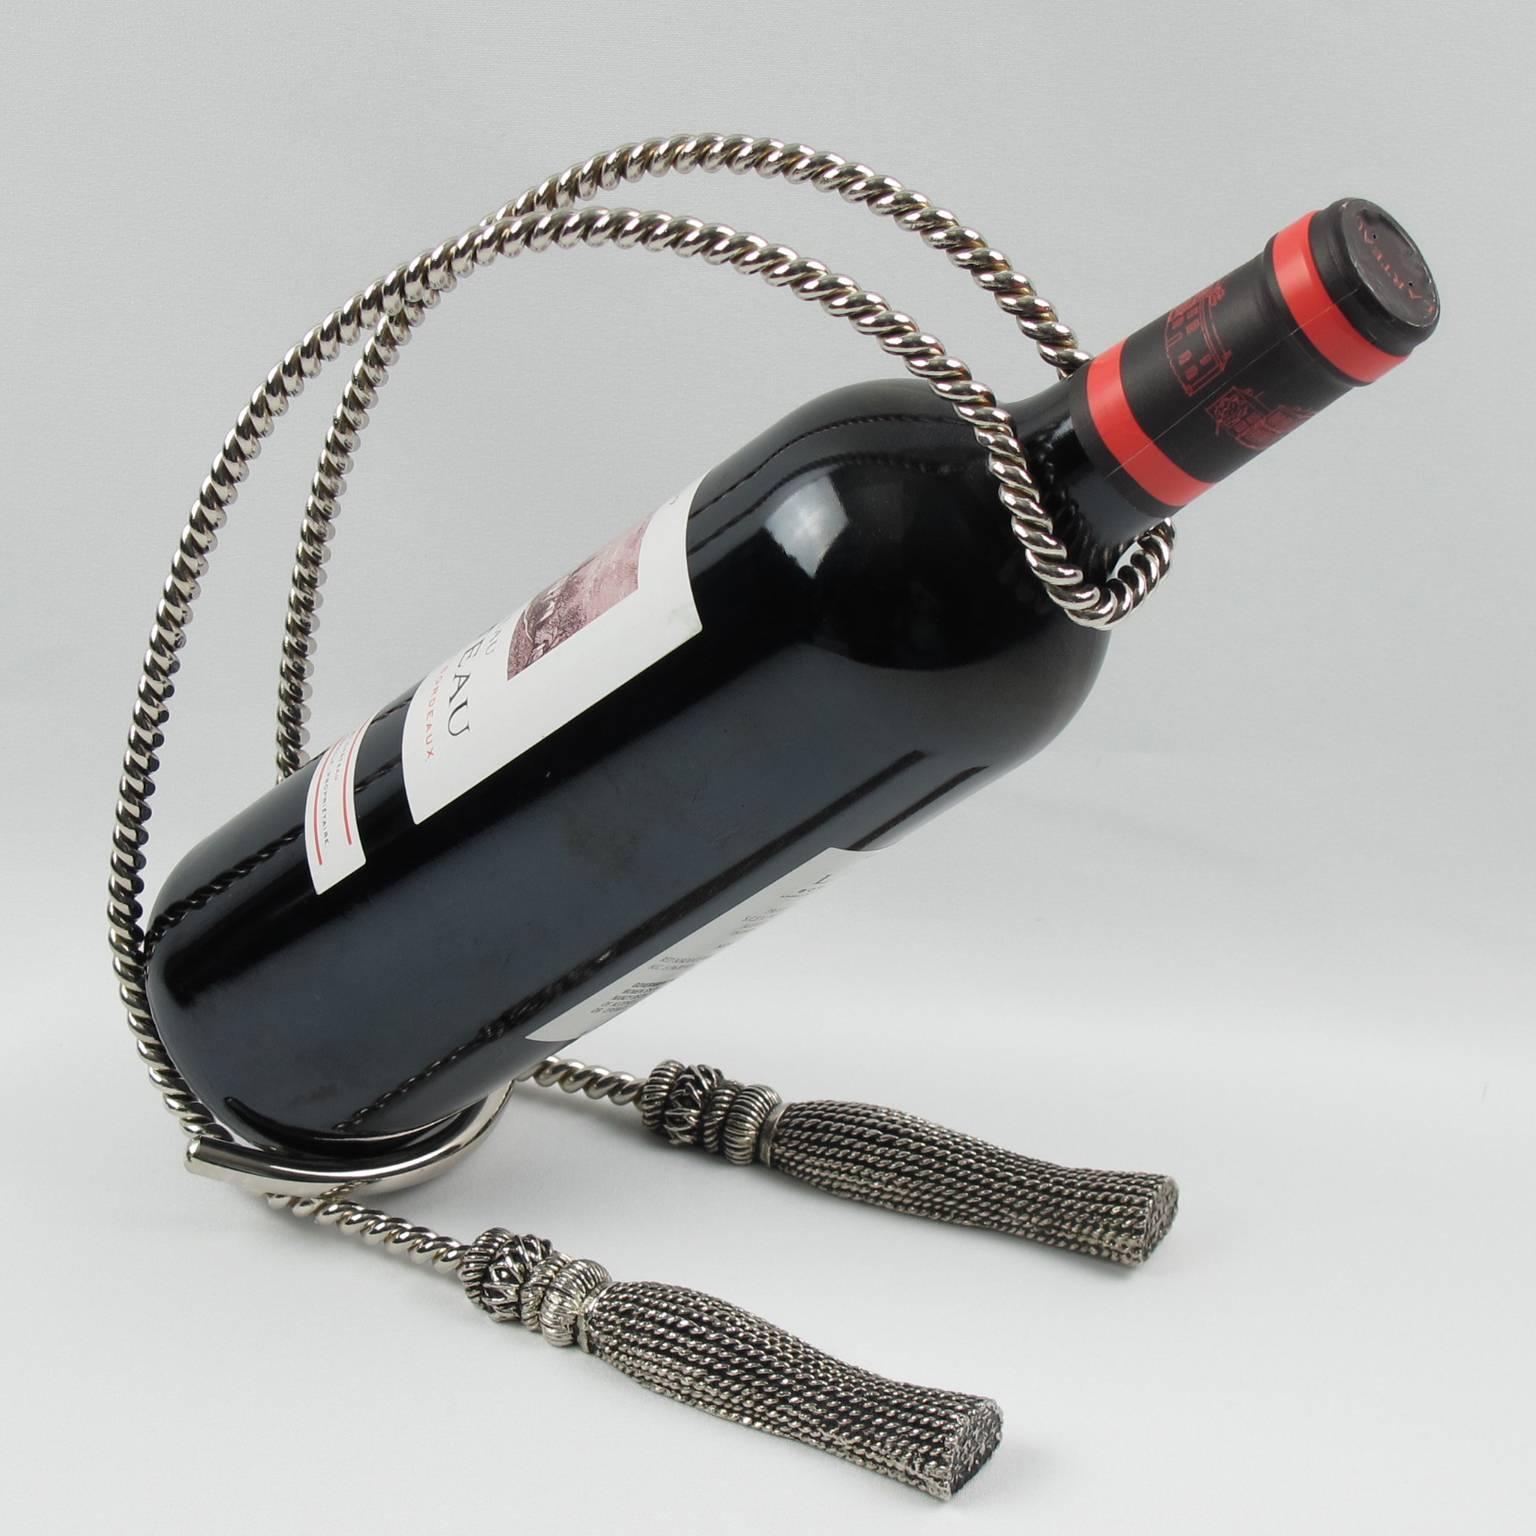 Silver Plate Wine Bottle Holder Pourer Caddy Rope and Tassel Design For Sale at 1stdibs & Silver Plate Wine Bottle Holder Pourer Caddy Rope and Tassel Design ...